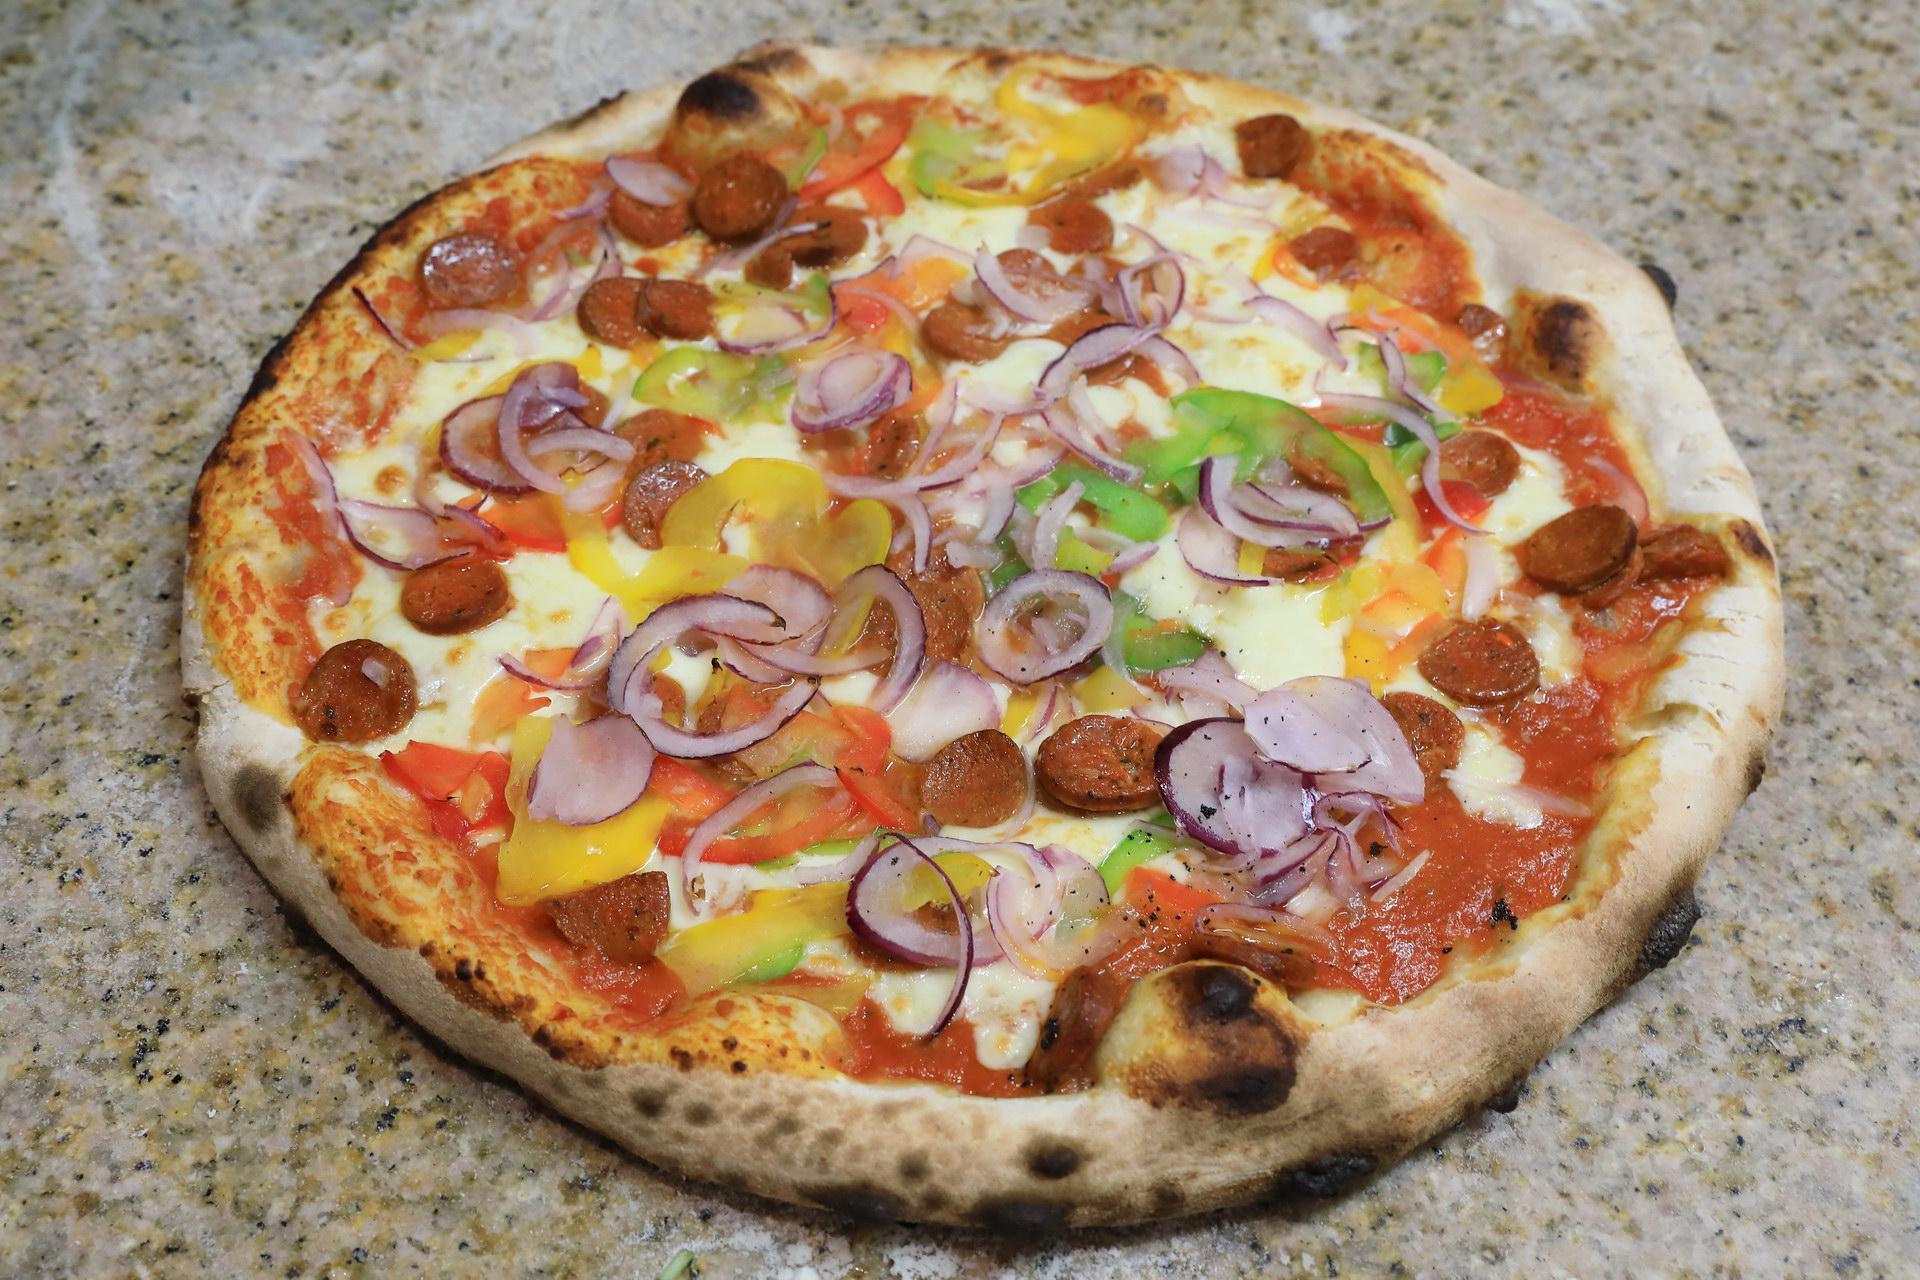 Le-Mediterraneen-Pizza-Braine-l-Alleud-0047.jpg